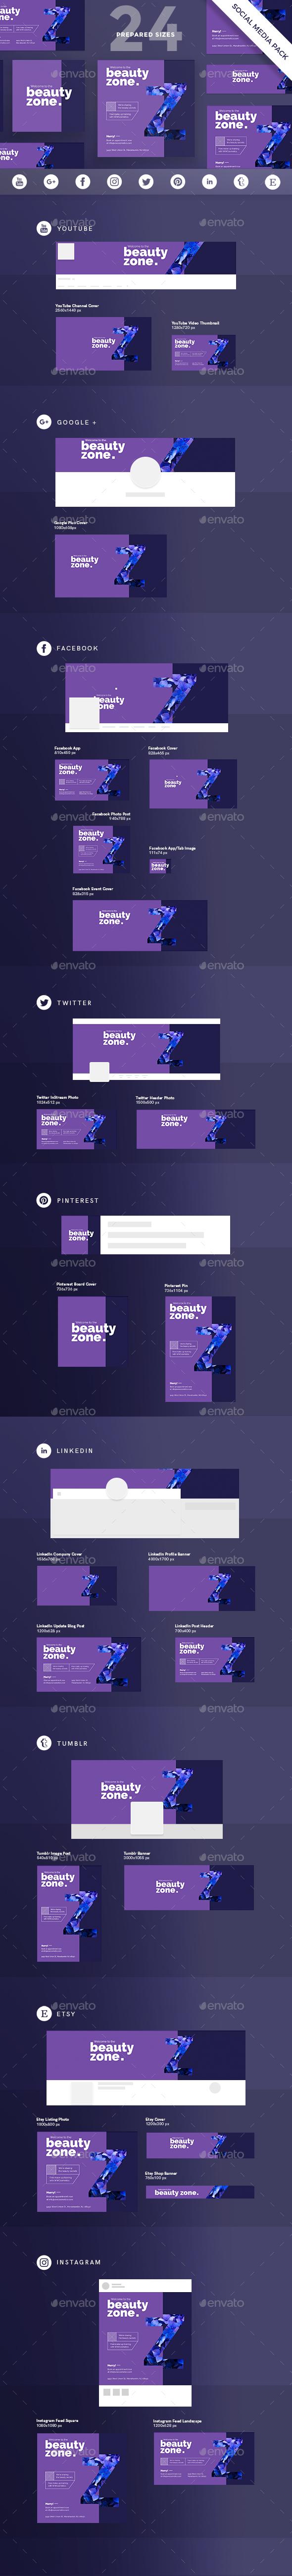 Beauty Zone Social Media Pack - Miscellaneous Social Media